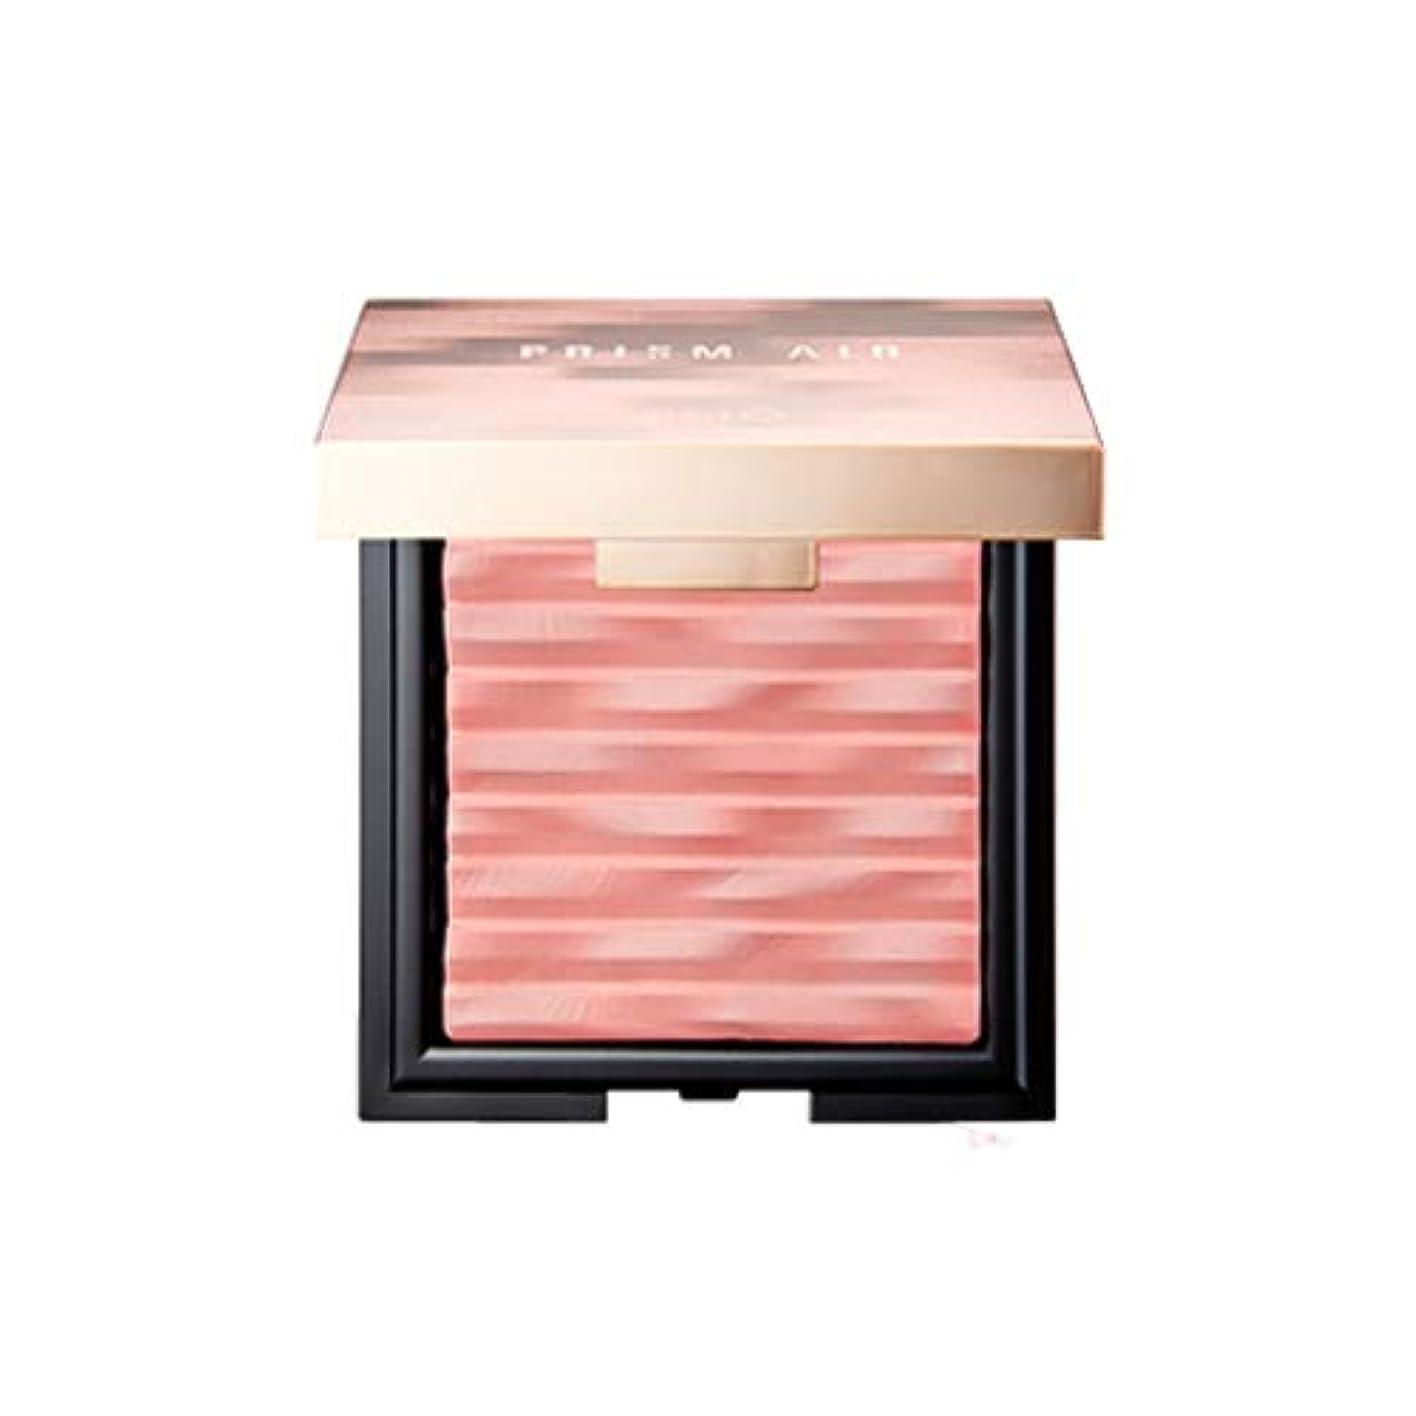 Clio Prism Air Blusher クリオプリズムエアブラッシャー (#01 Muted Pink) 並行輸入品 [並行輸入品]